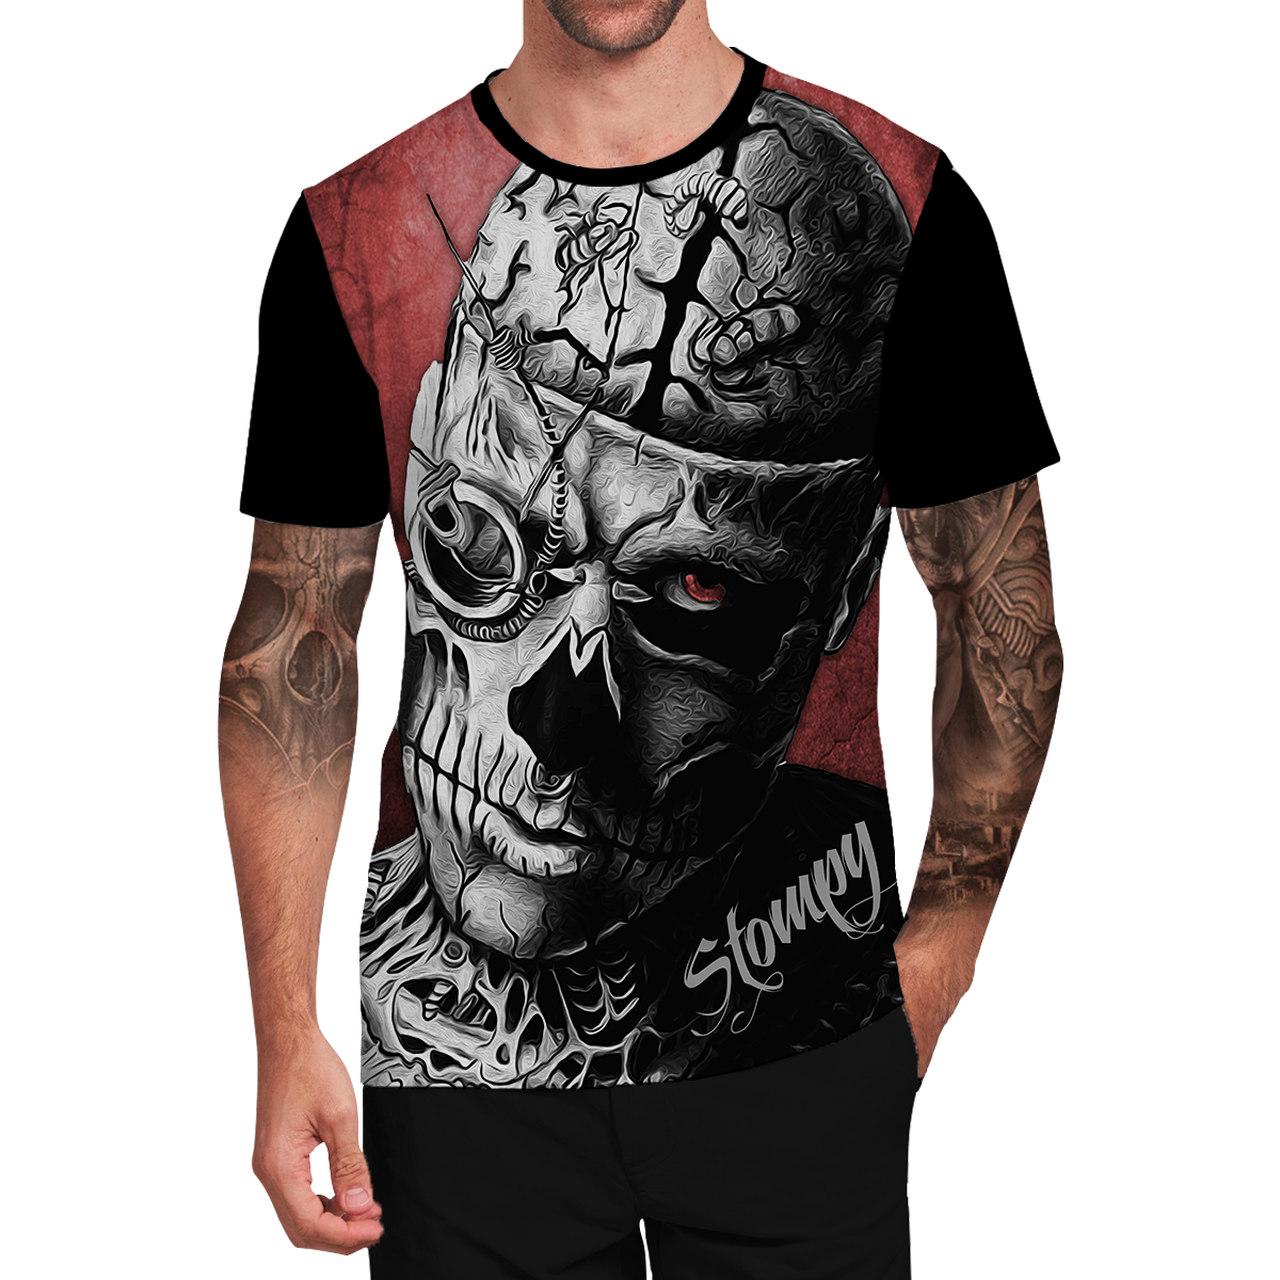 Stompy Camiseta Tattoo Tatuagem Caveira Skull 92